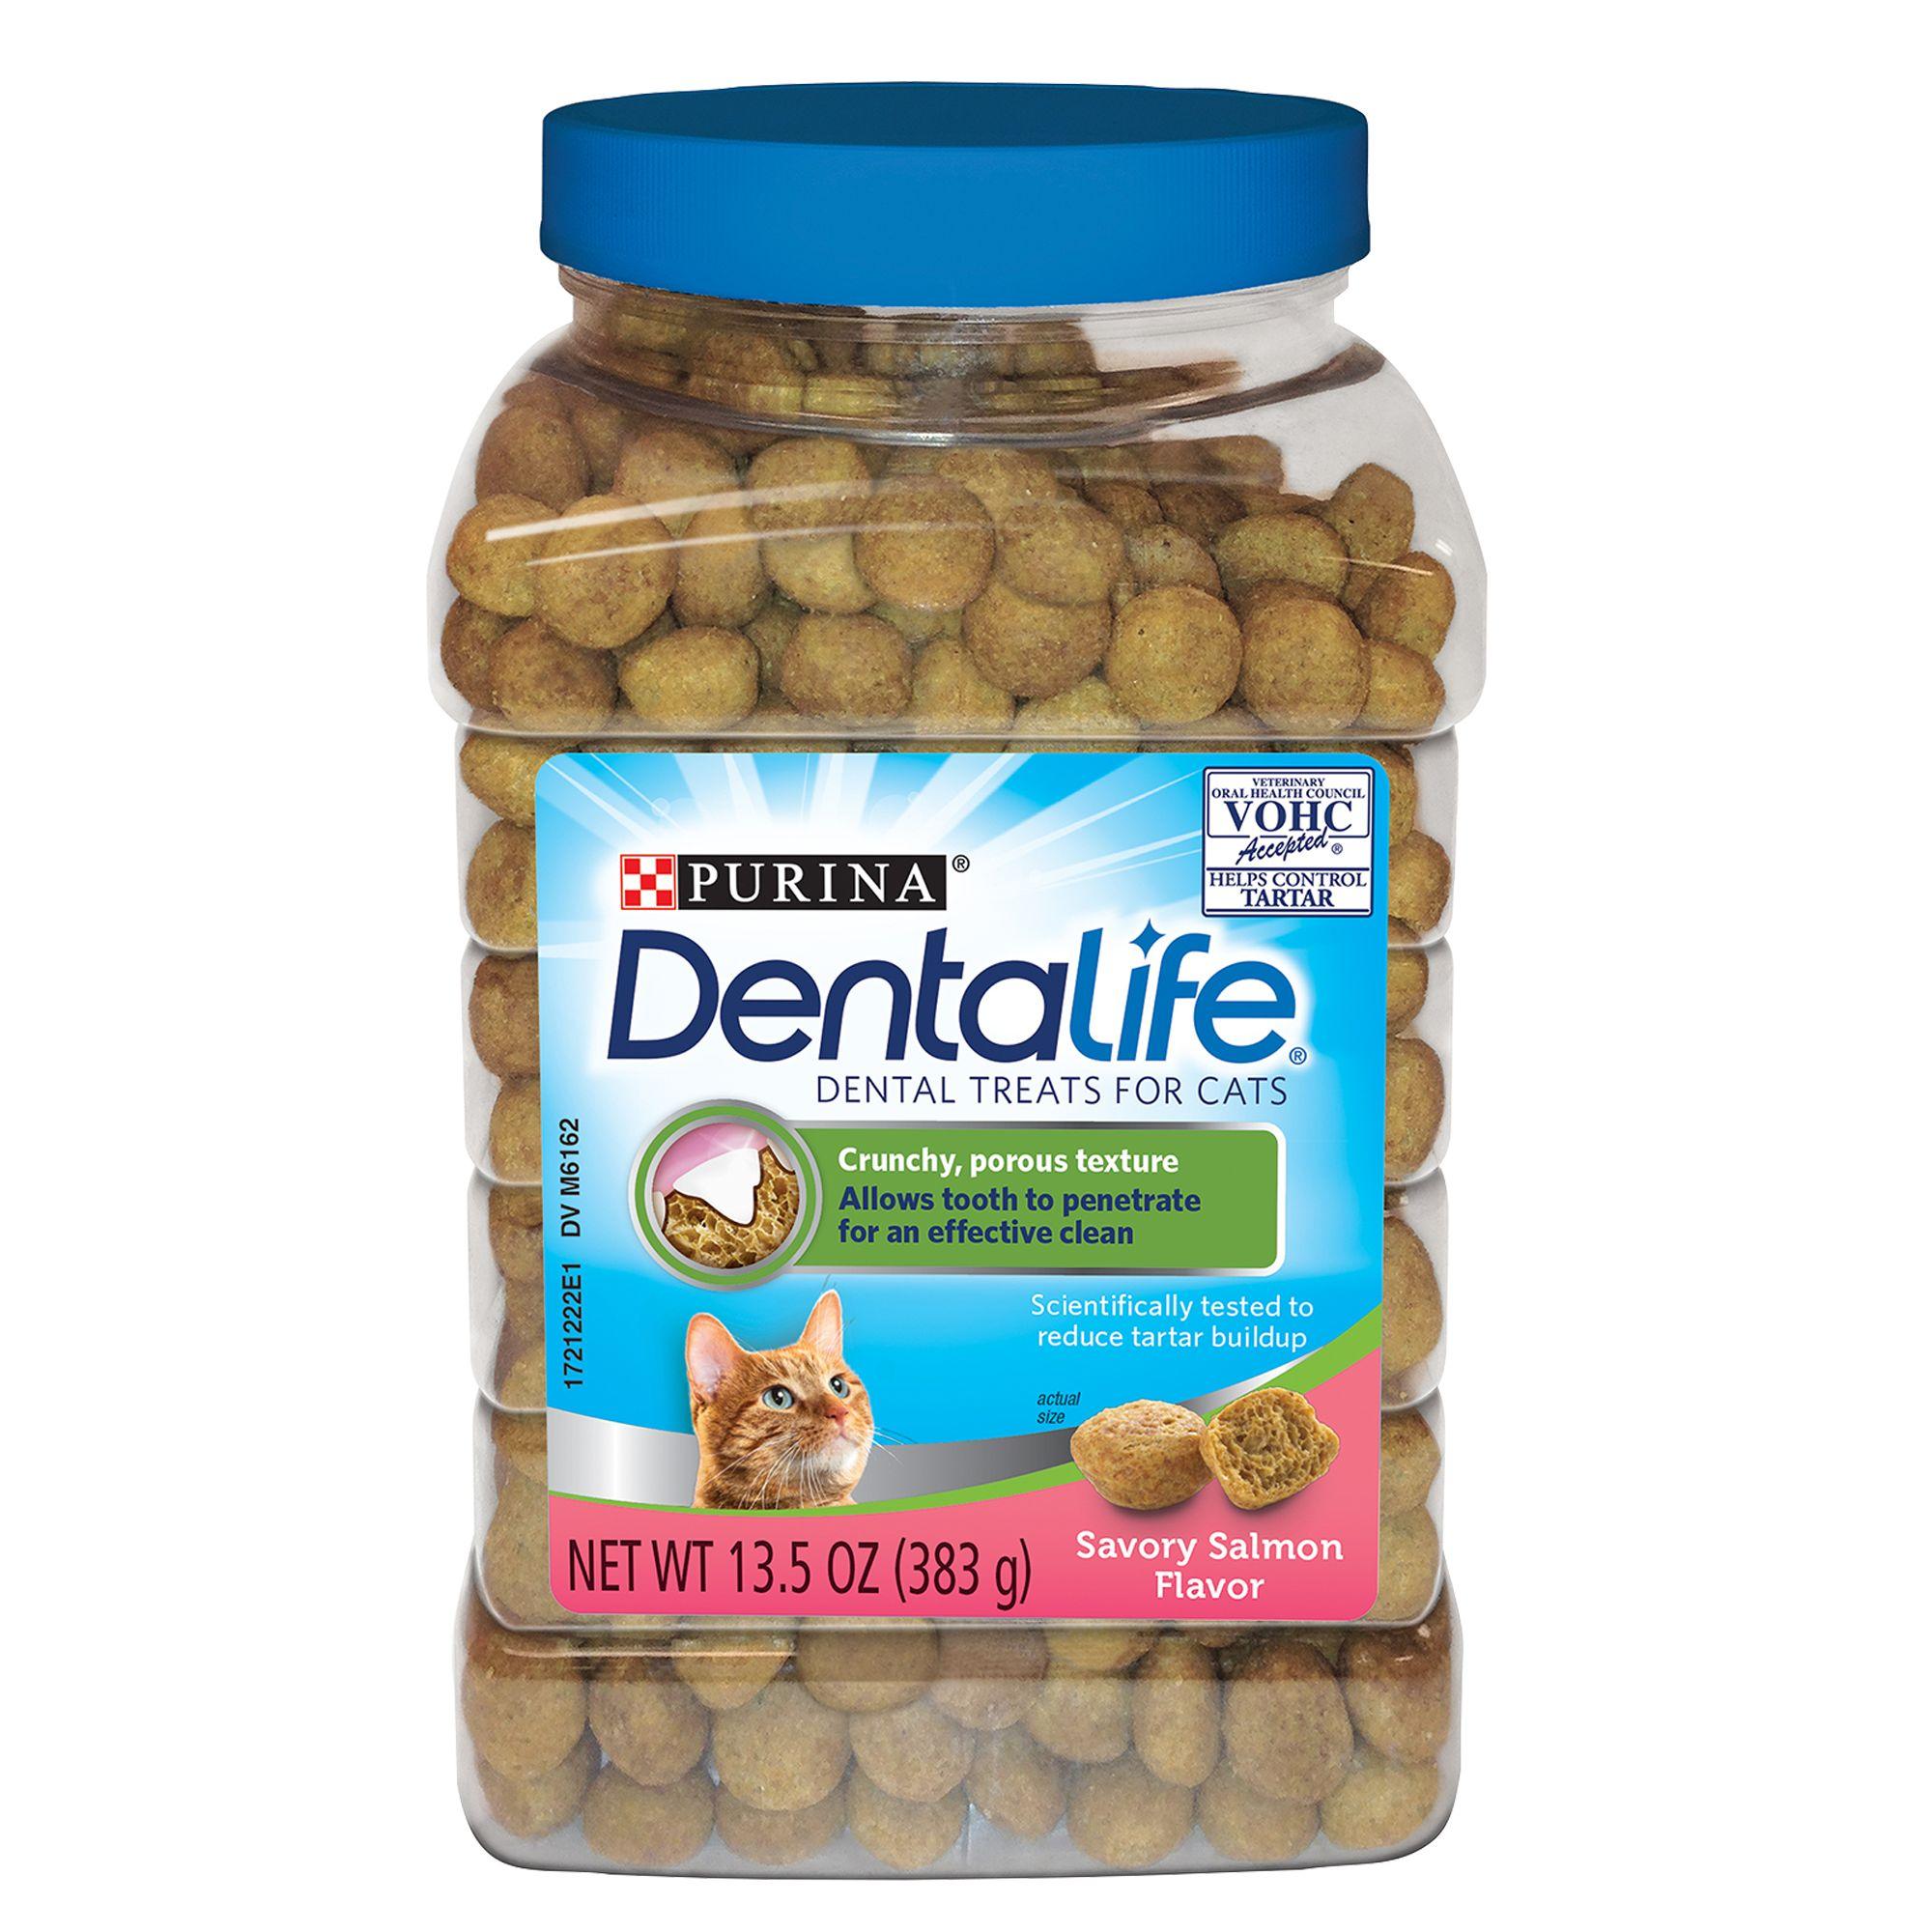 Purina Dentalife Dental Cat Treats Salmon Size 13.5 Oz